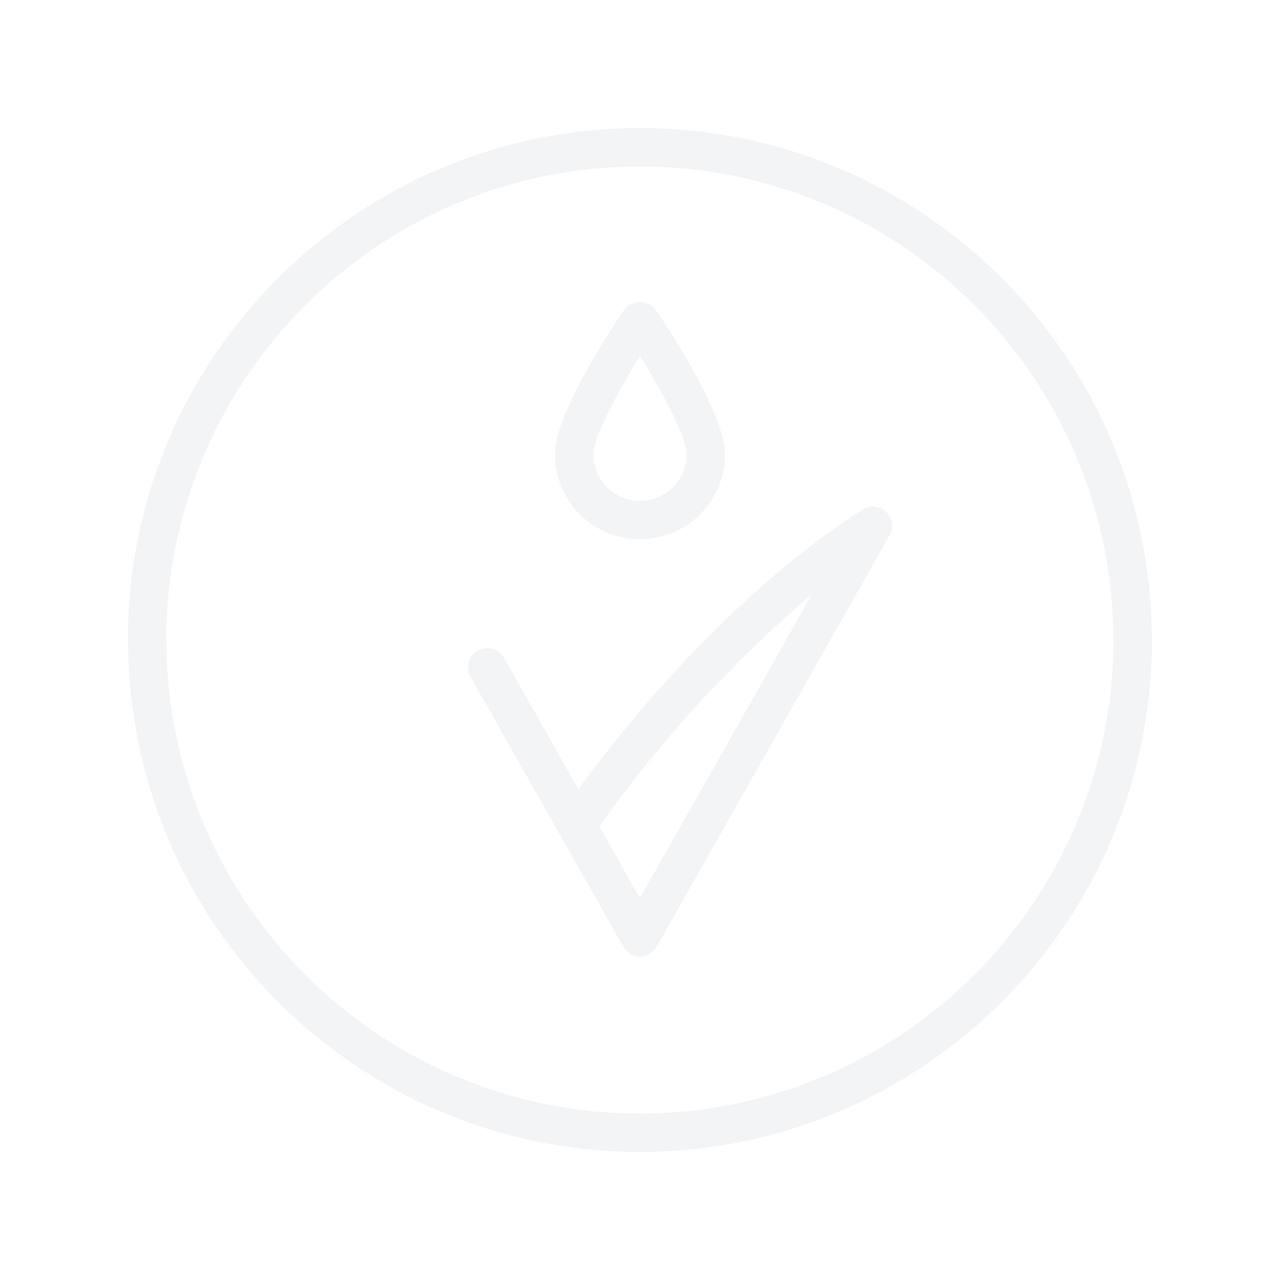 MIZON Joyful Time Essence Green Tea Mask 23g